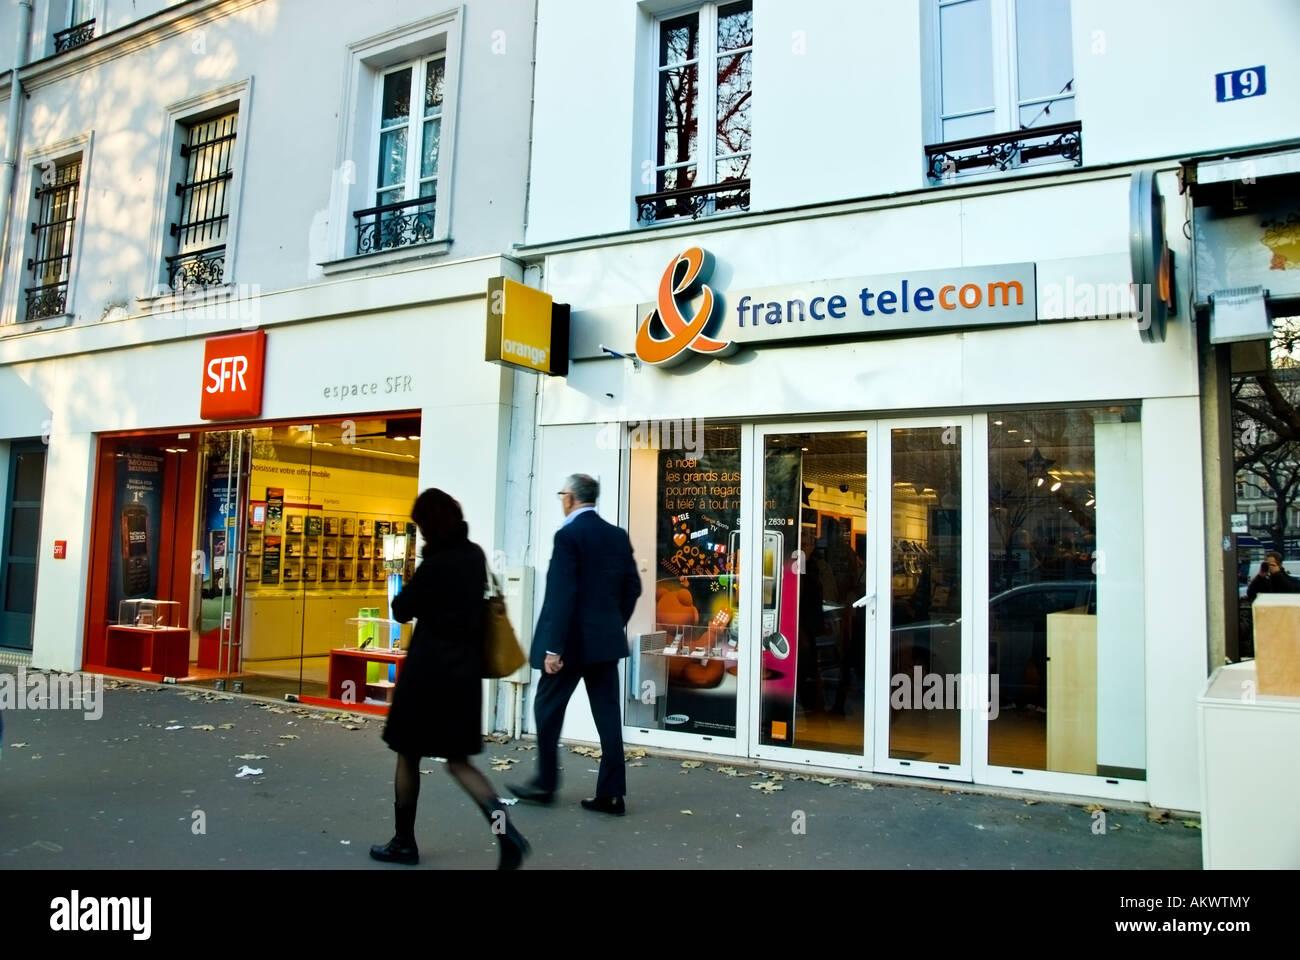 france telecom stock photos france telecom stock images alamy. Black Bedroom Furniture Sets. Home Design Ideas